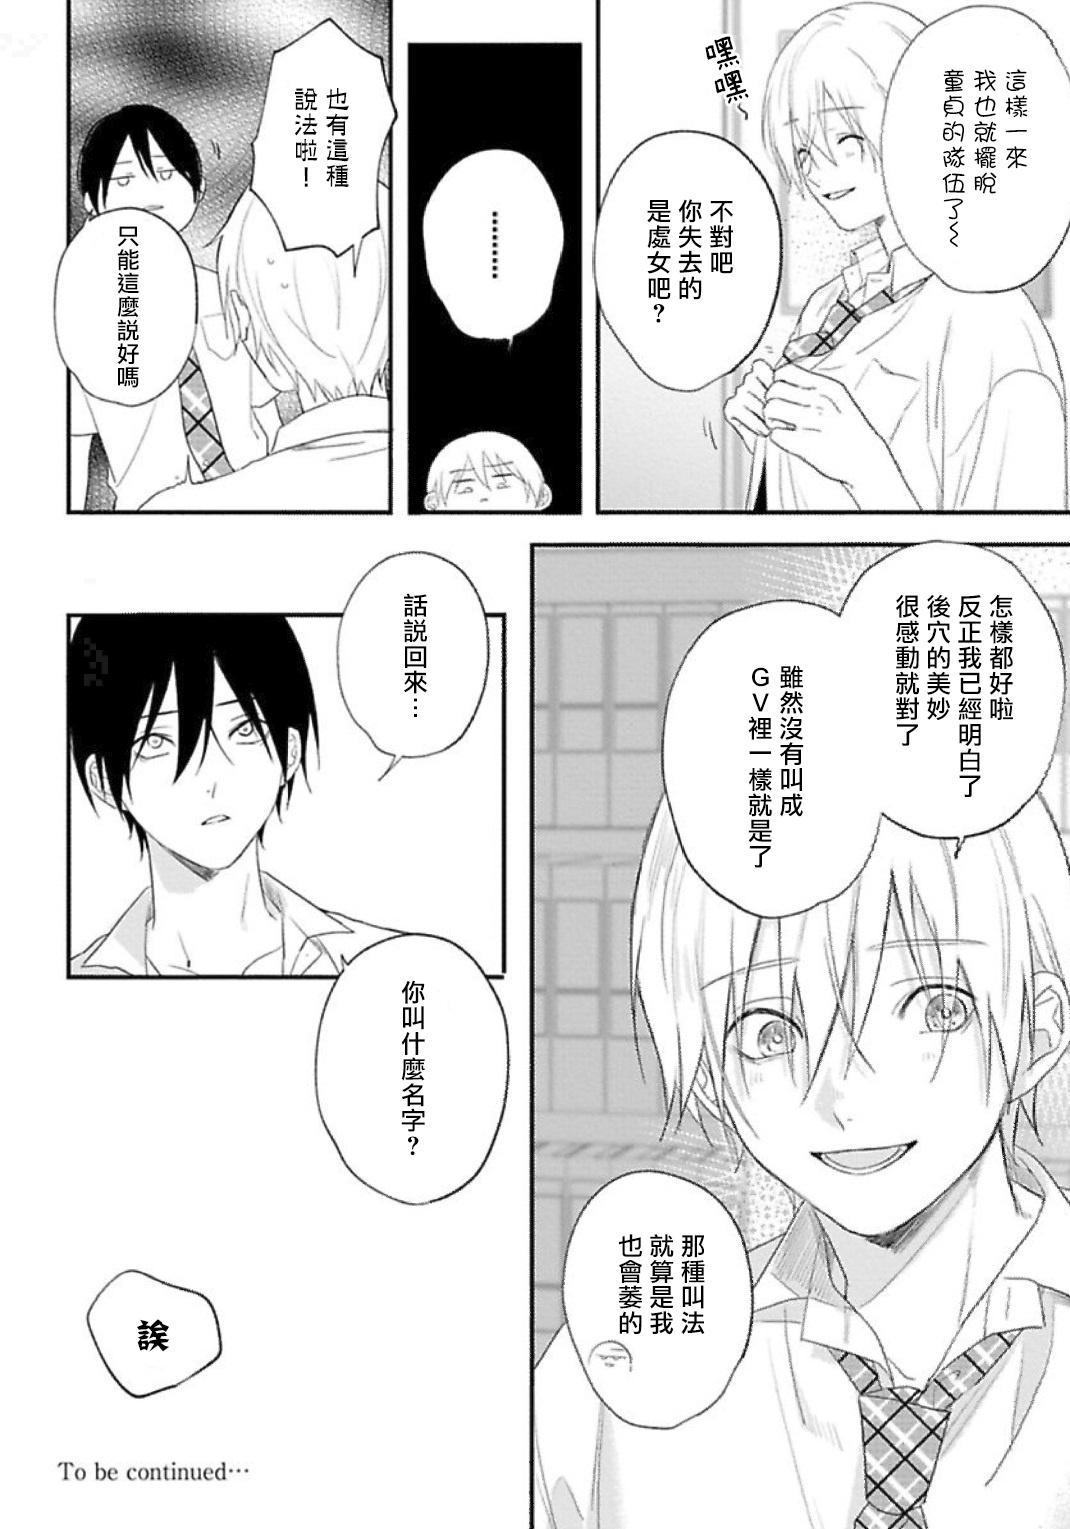 [Utata Hakuto] Houkago Virginity - Virginity afterschool 1-5 完结 [Chinese] [拾荒者汉化组] [Digital] 33